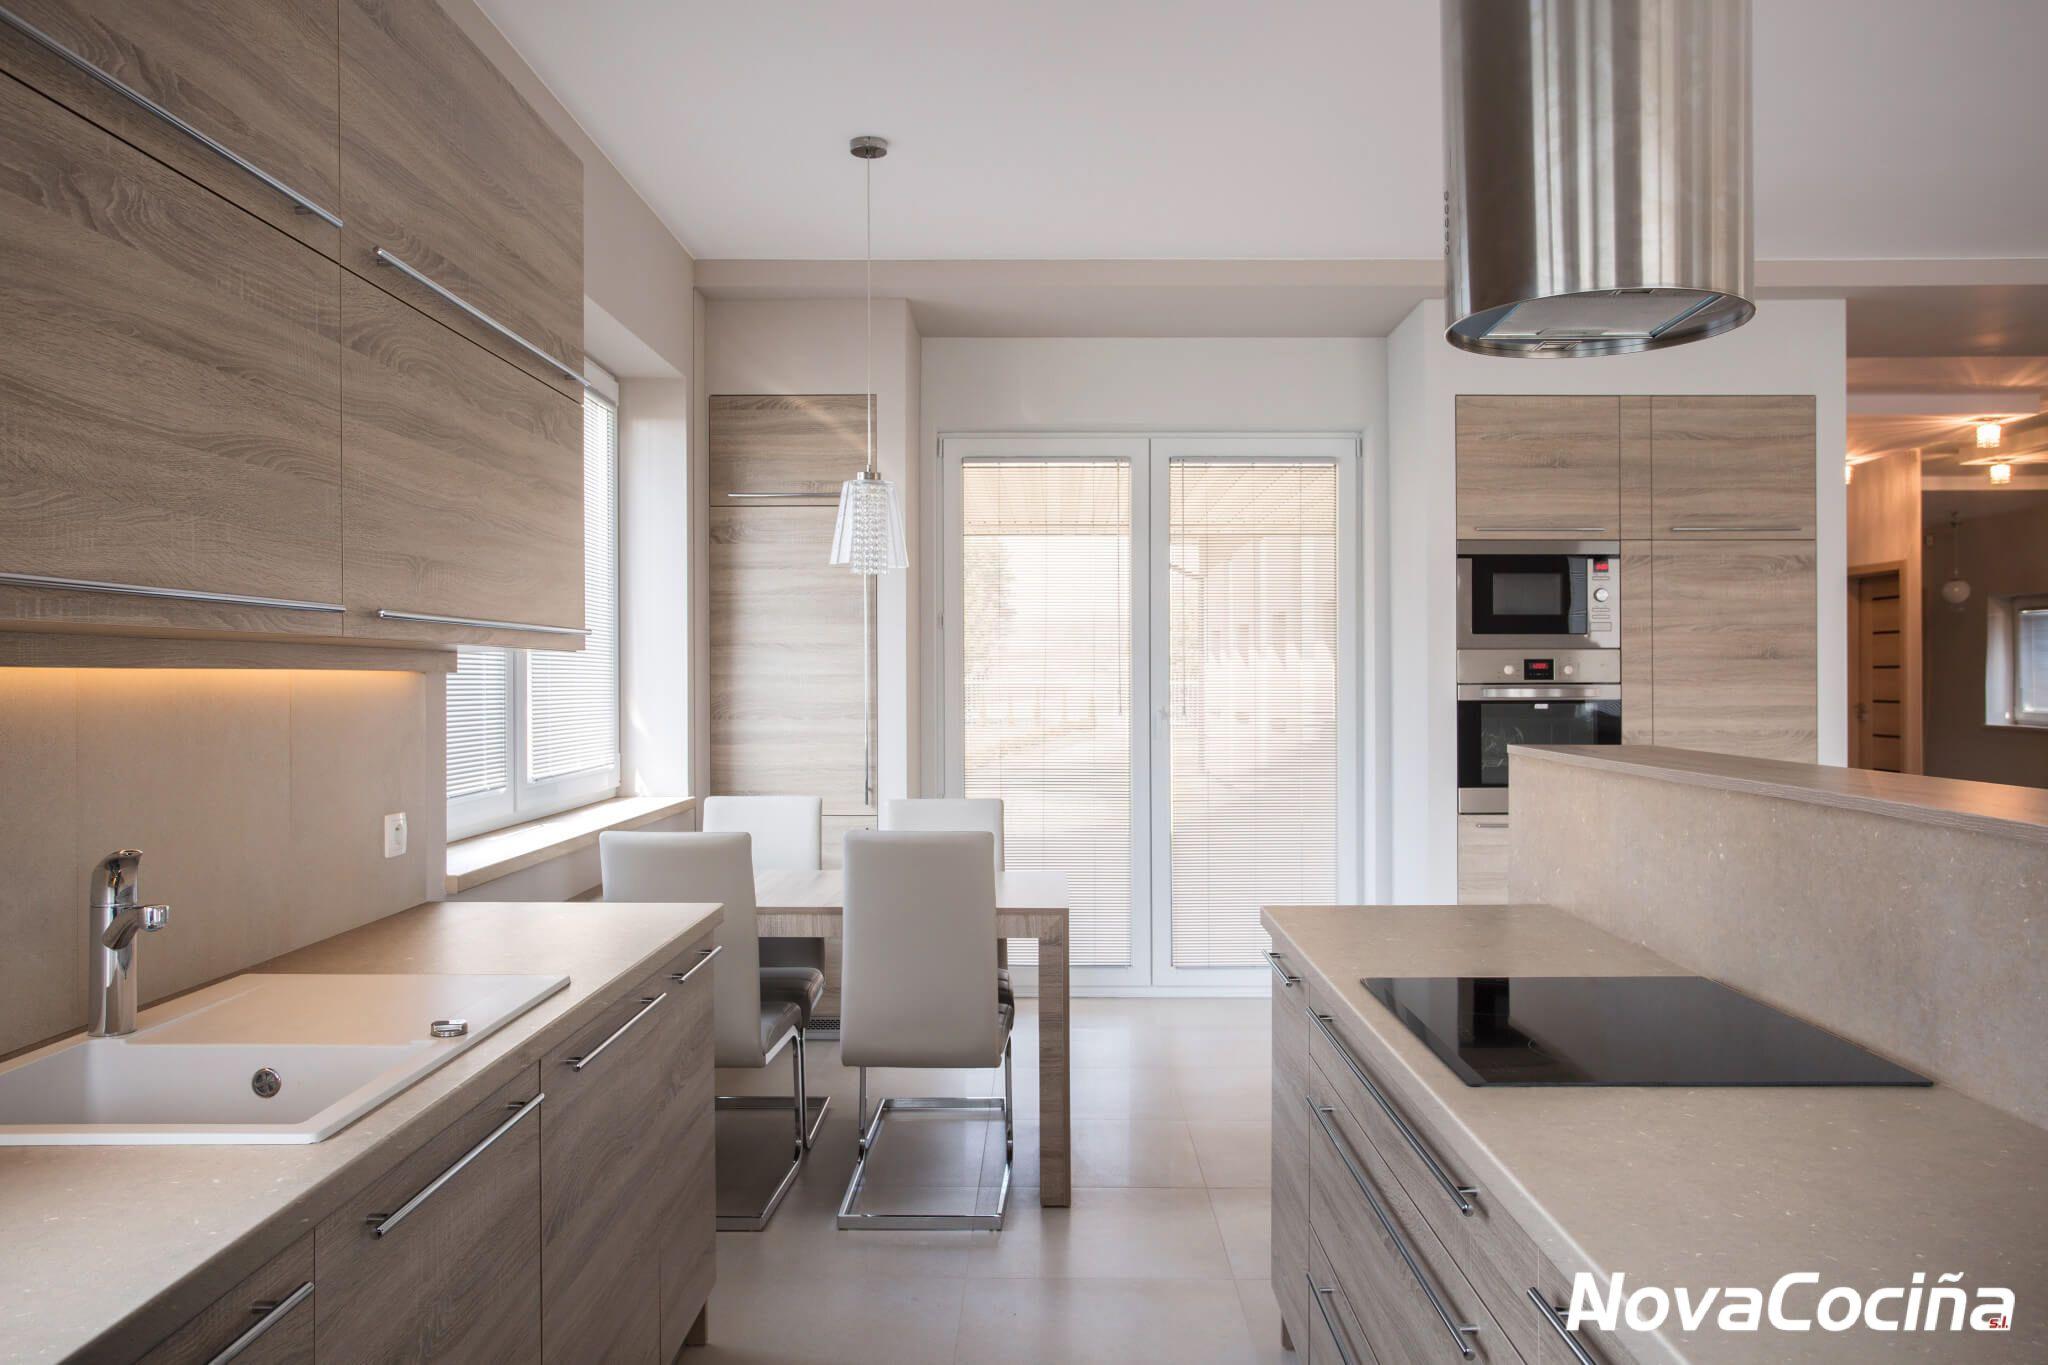 Cocina Con Encimera Coral Clay De Silestone Kitchen Design Kitchen Countertops Diy Countertops